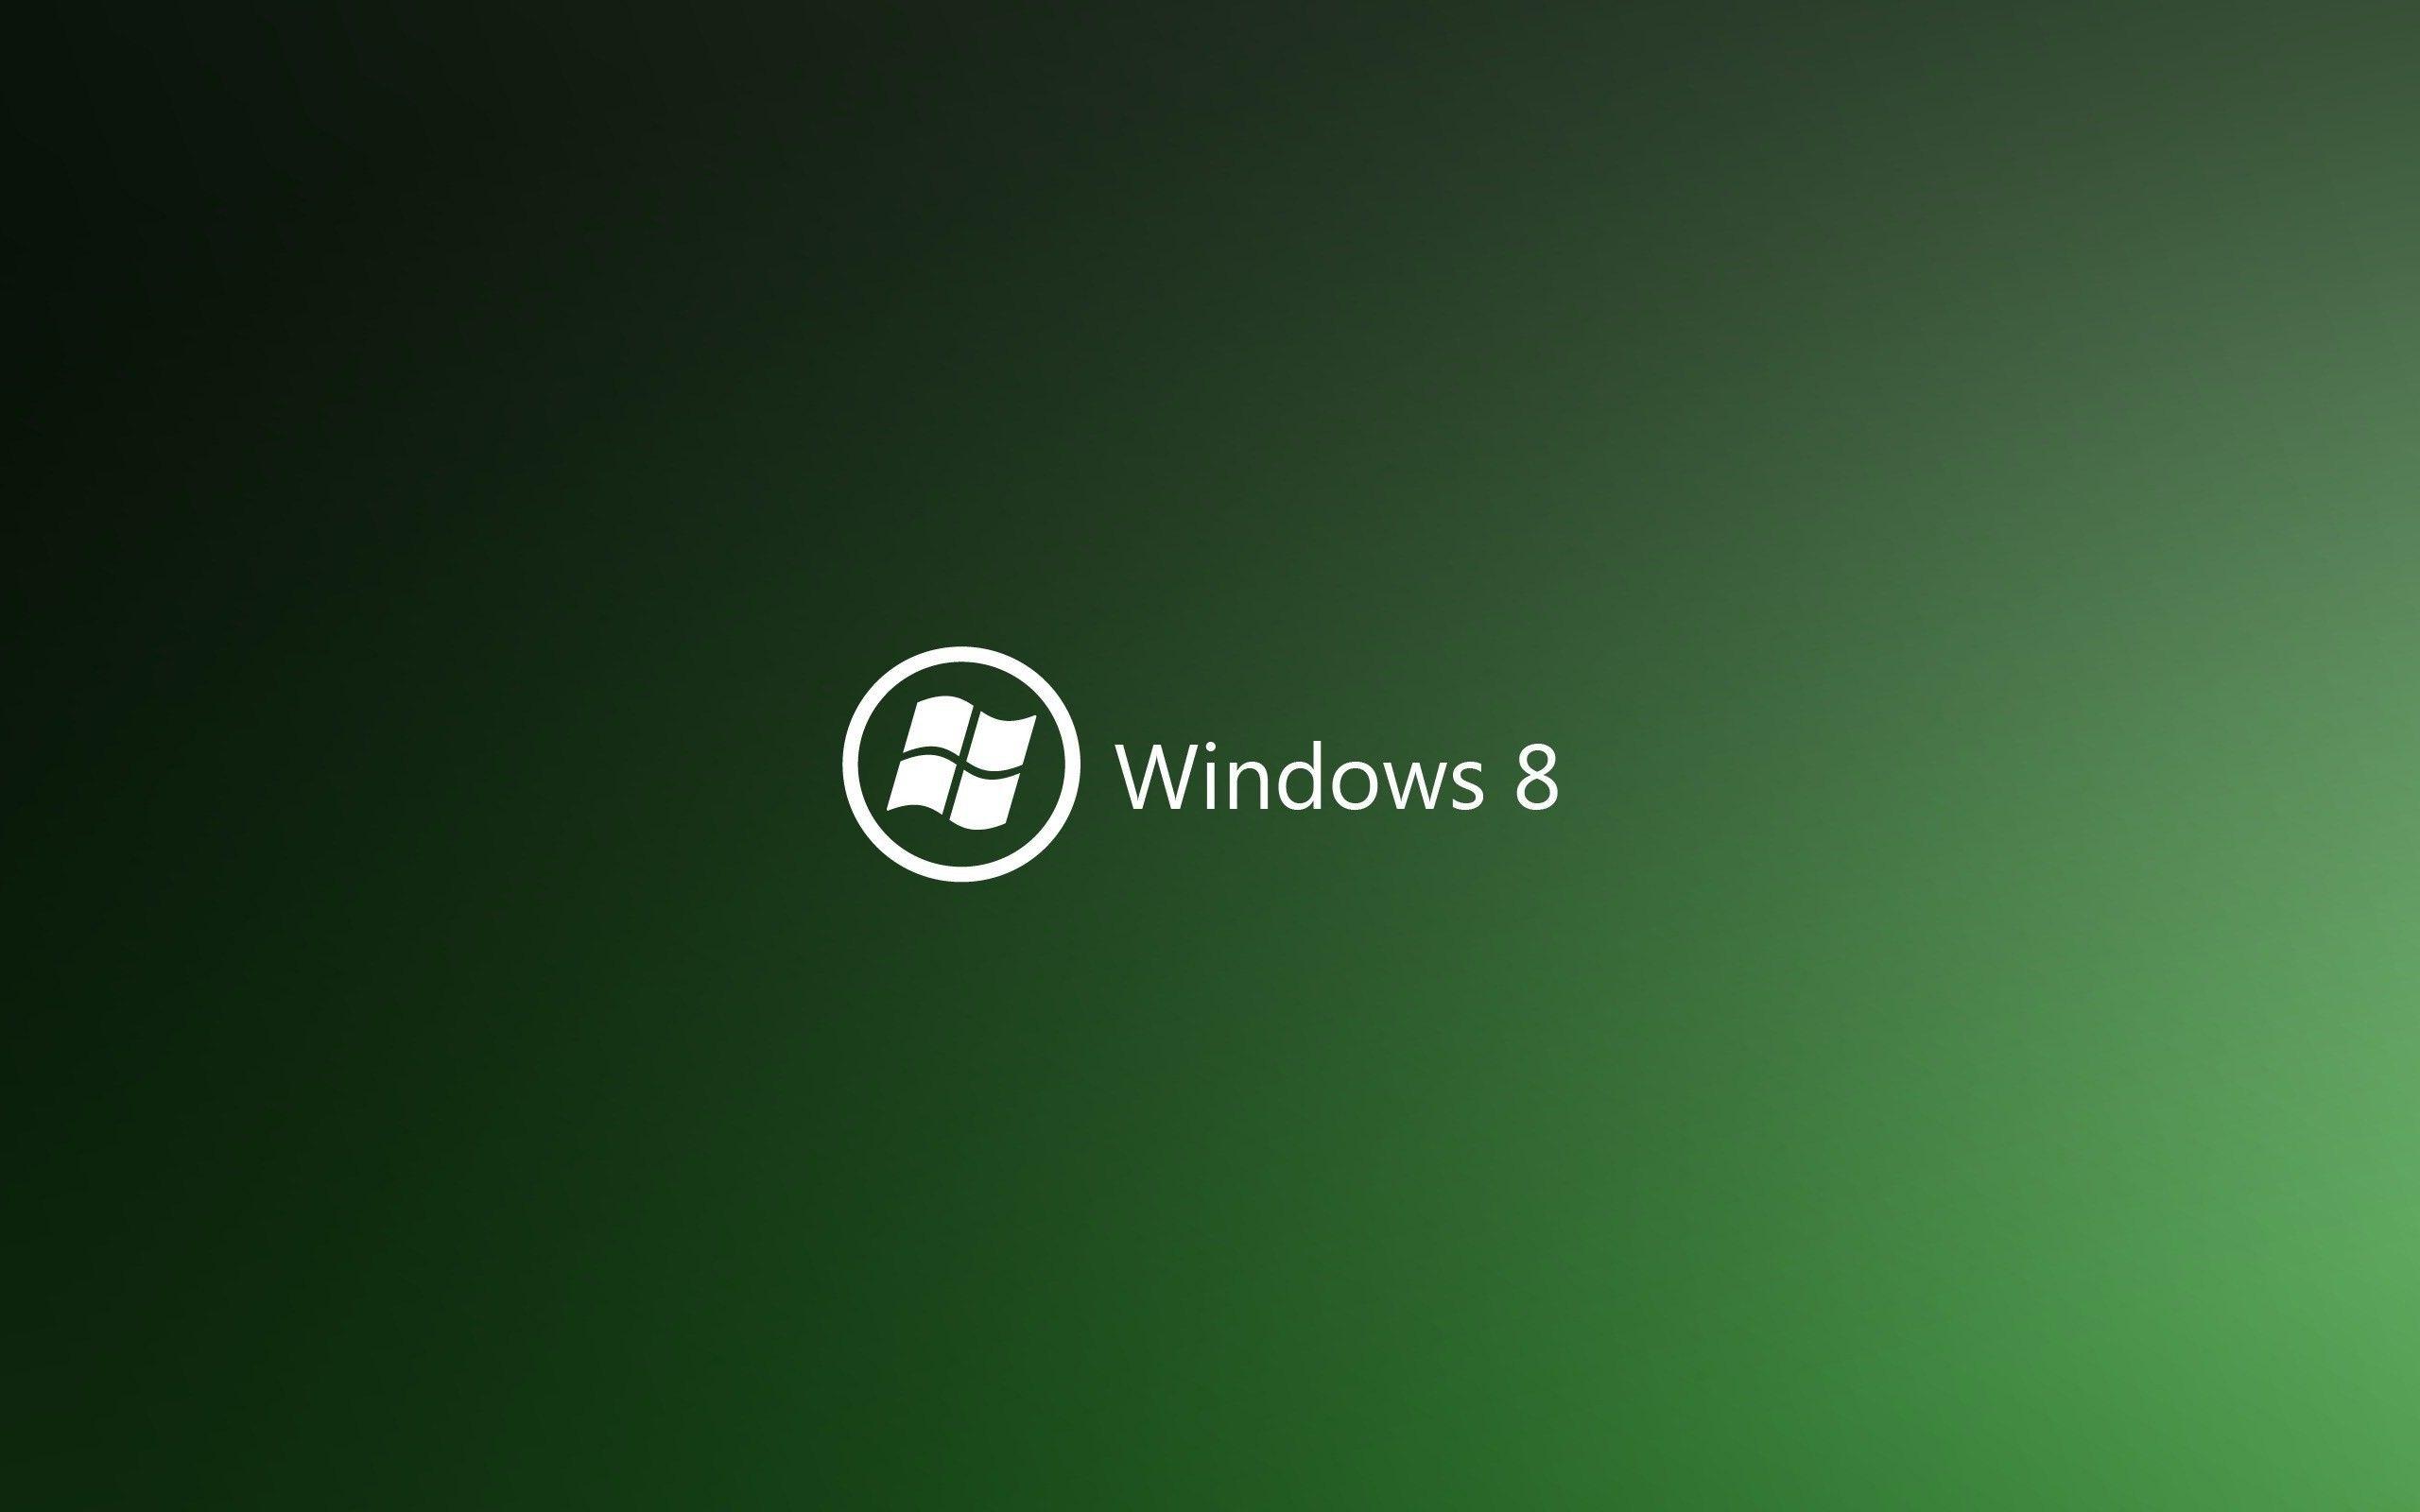 windows-8-green-logo-hd-wallpaper | windows hd wallpapers